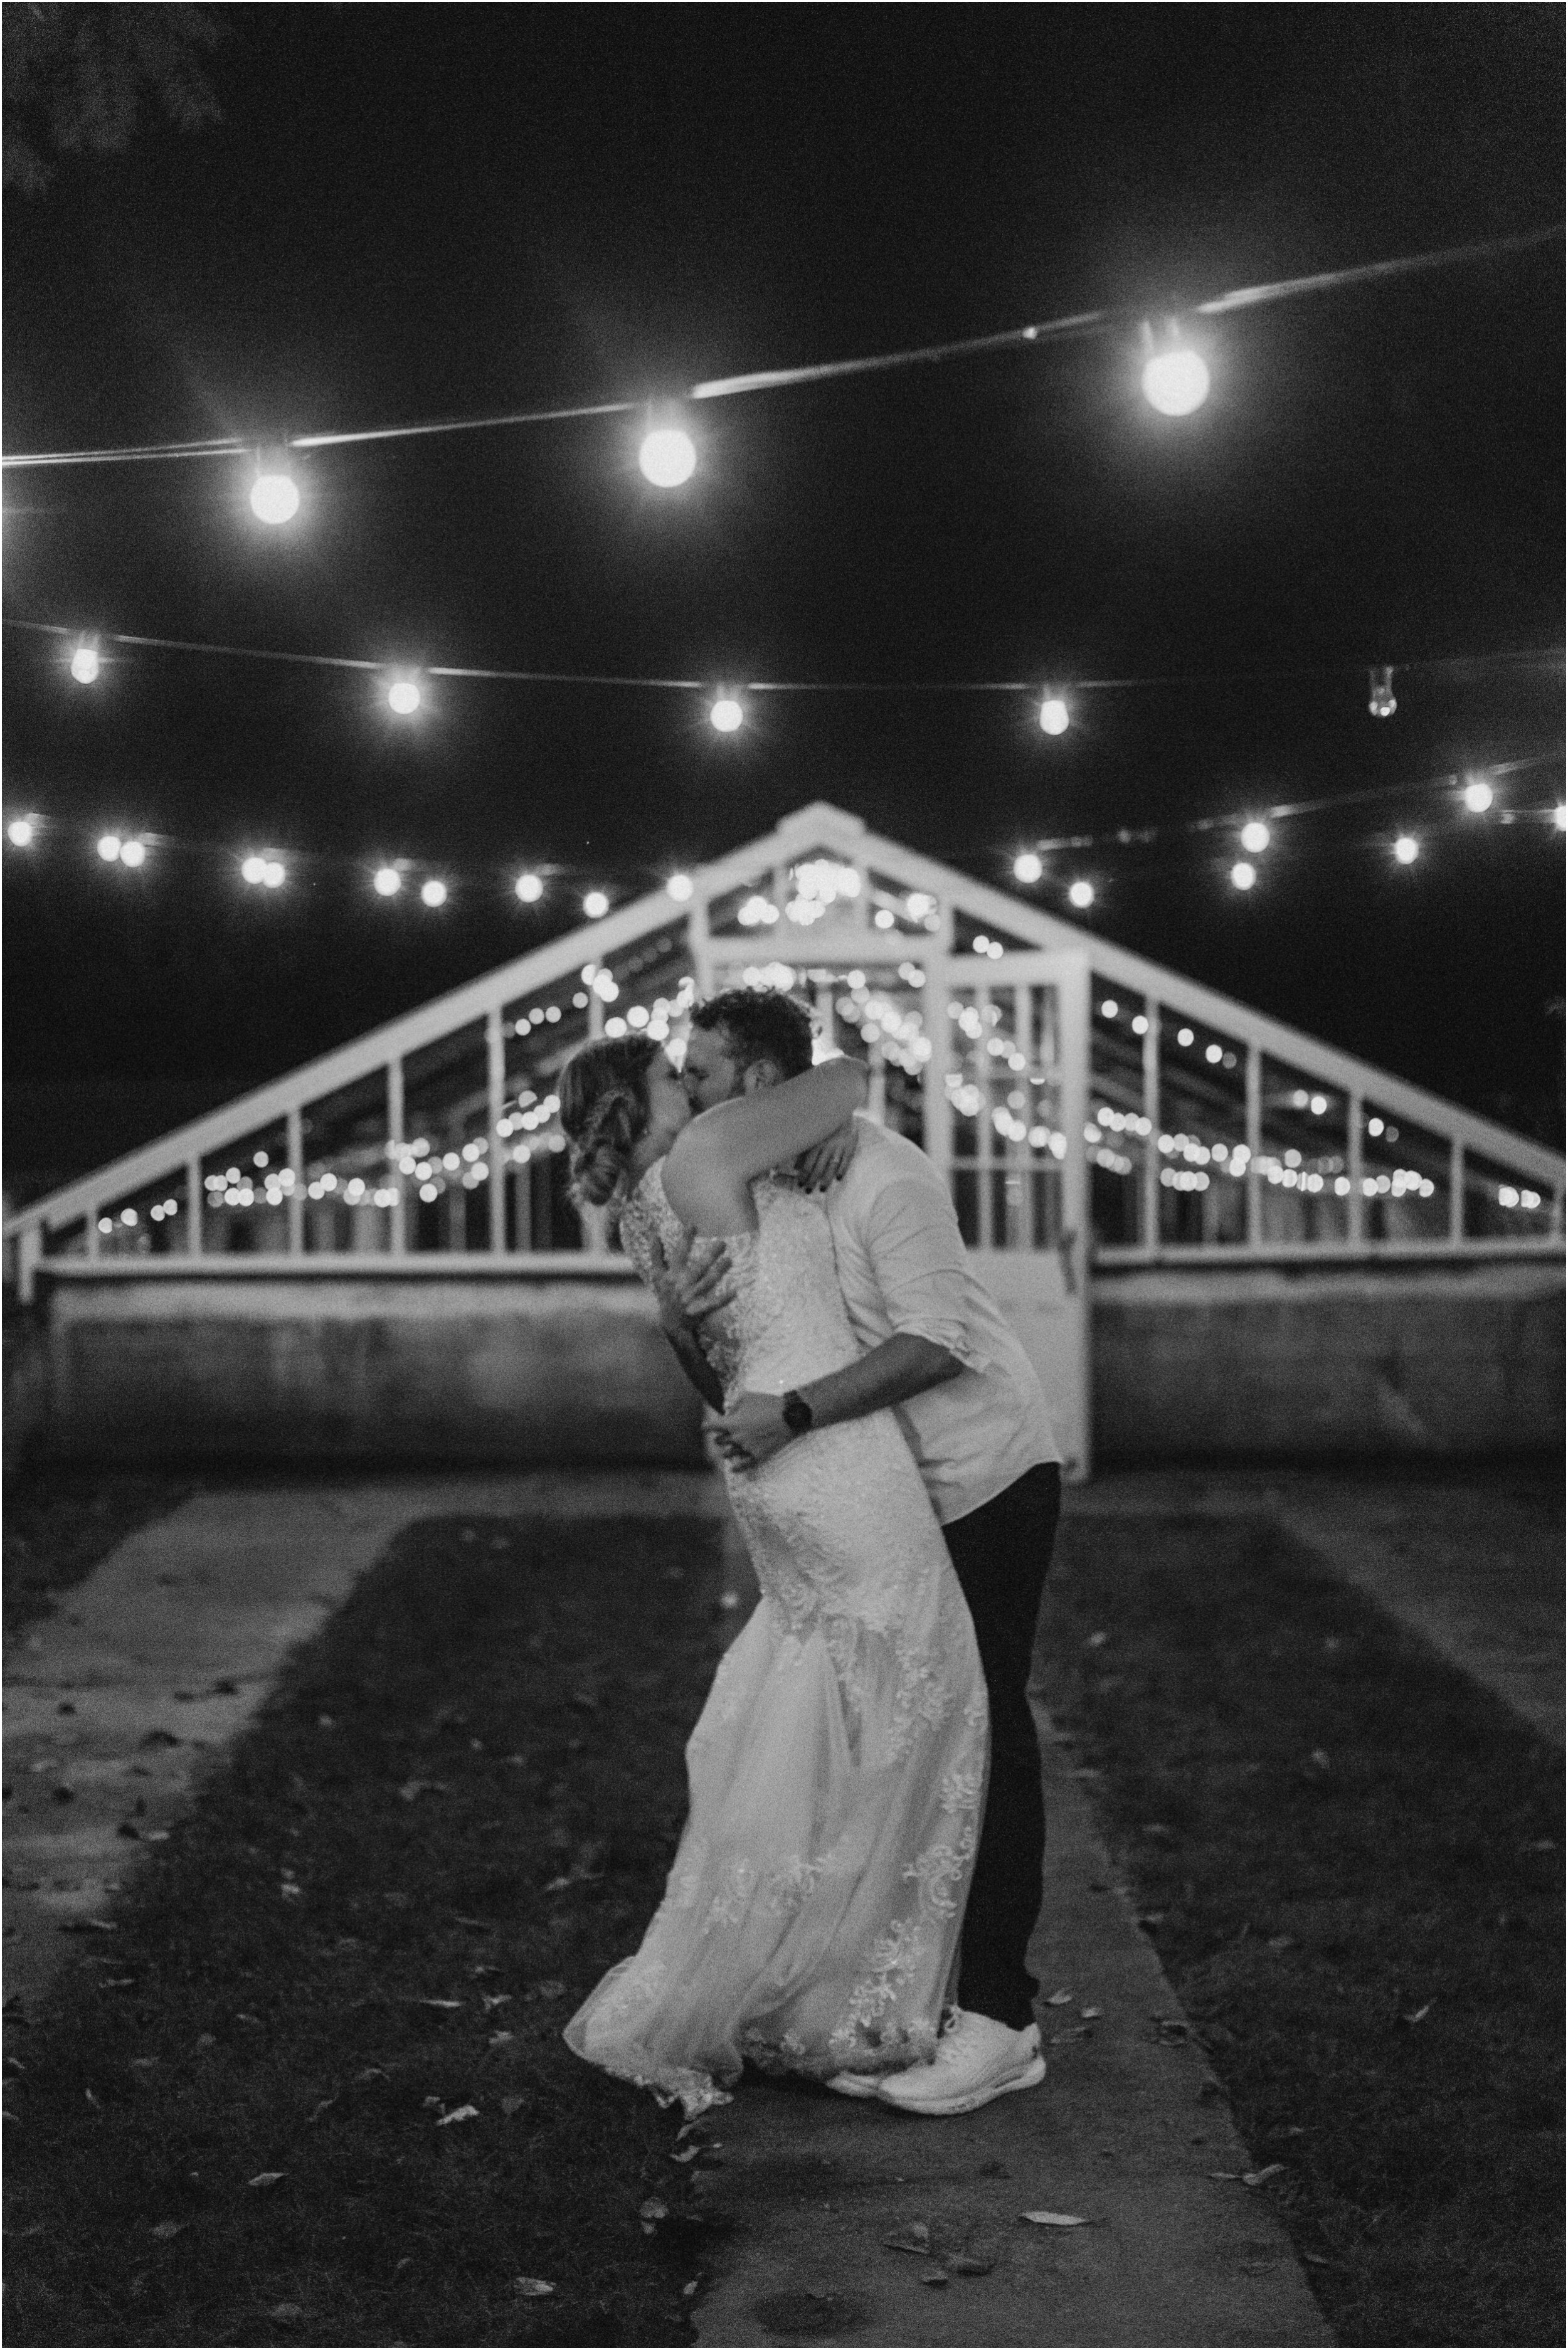 steph-and-jordan-cox-our-wedding-historic-shady-lane-compass-wedding-collective-hazel-lining-photography-destination-elopement-wedding-engagement-photography_0103.jpg